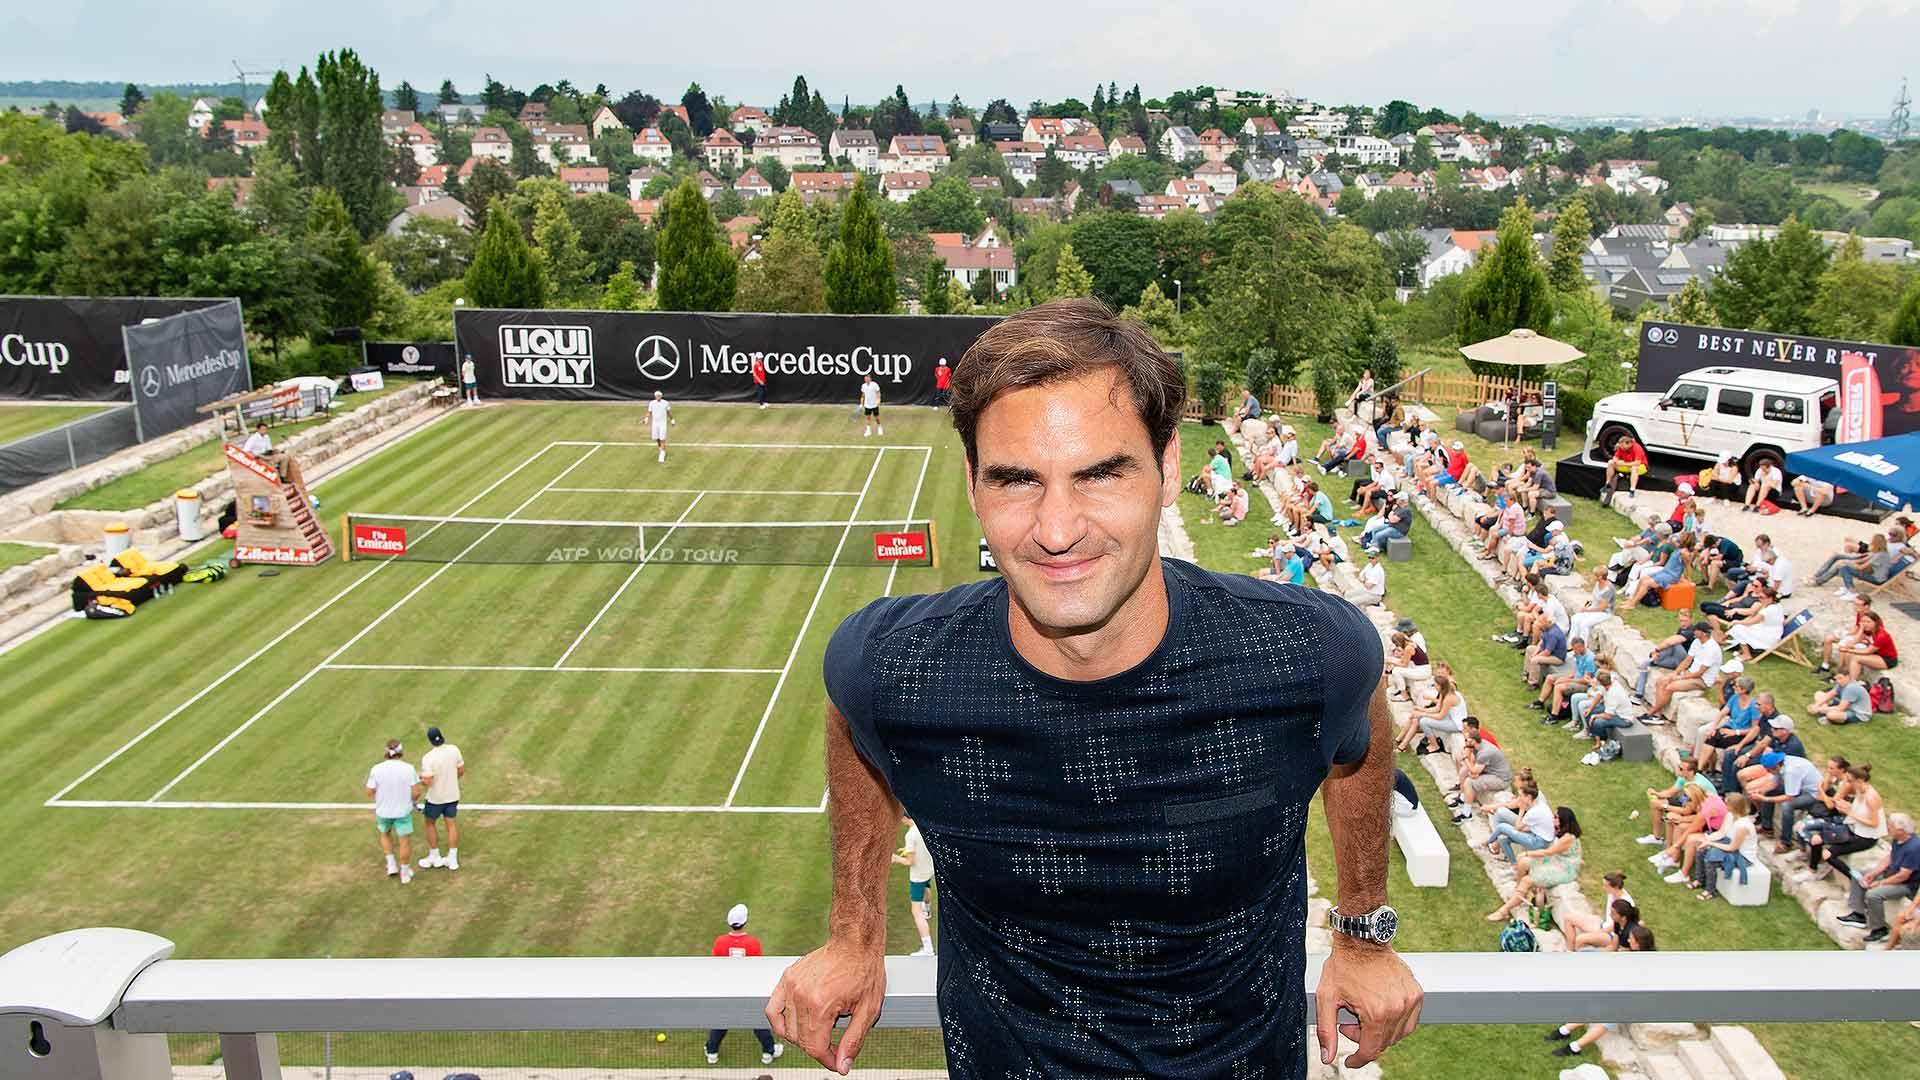 Stuttgart 2018 - ATP 250 - Page 6 Federer-stuttgart-2018-monday-1